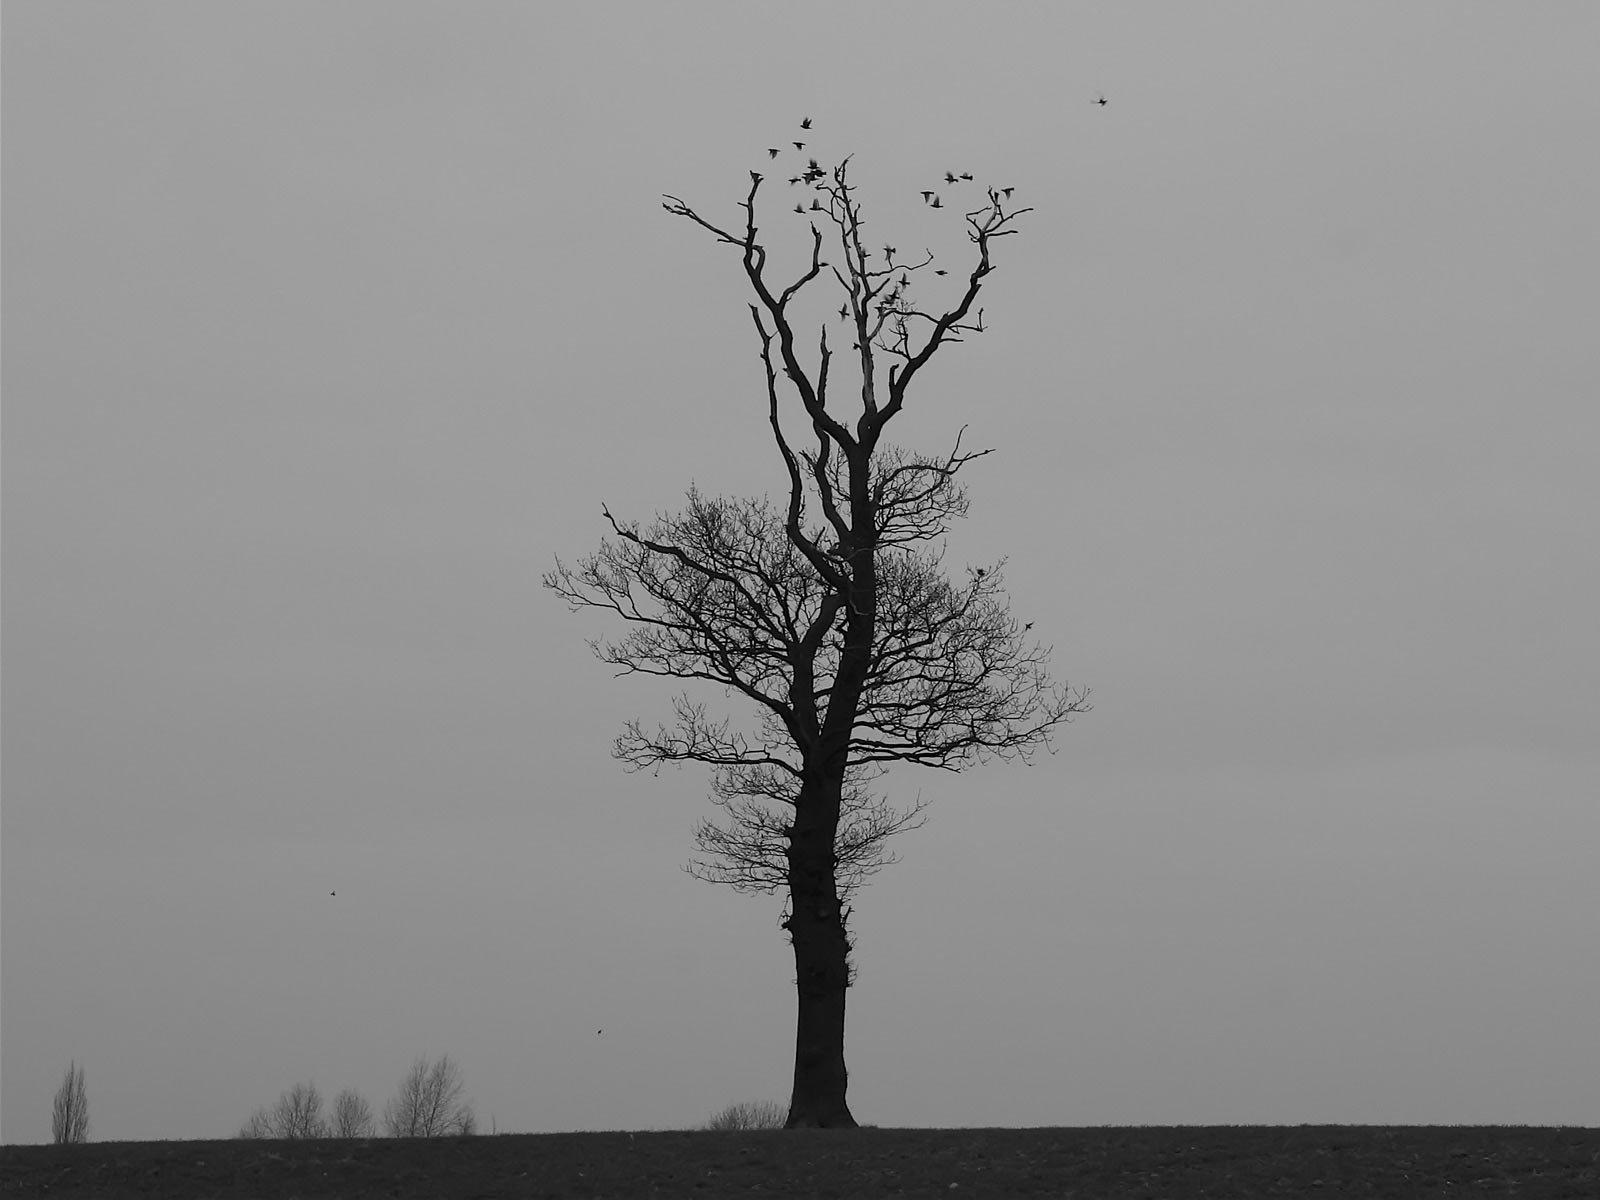 Manzara resimleri-164